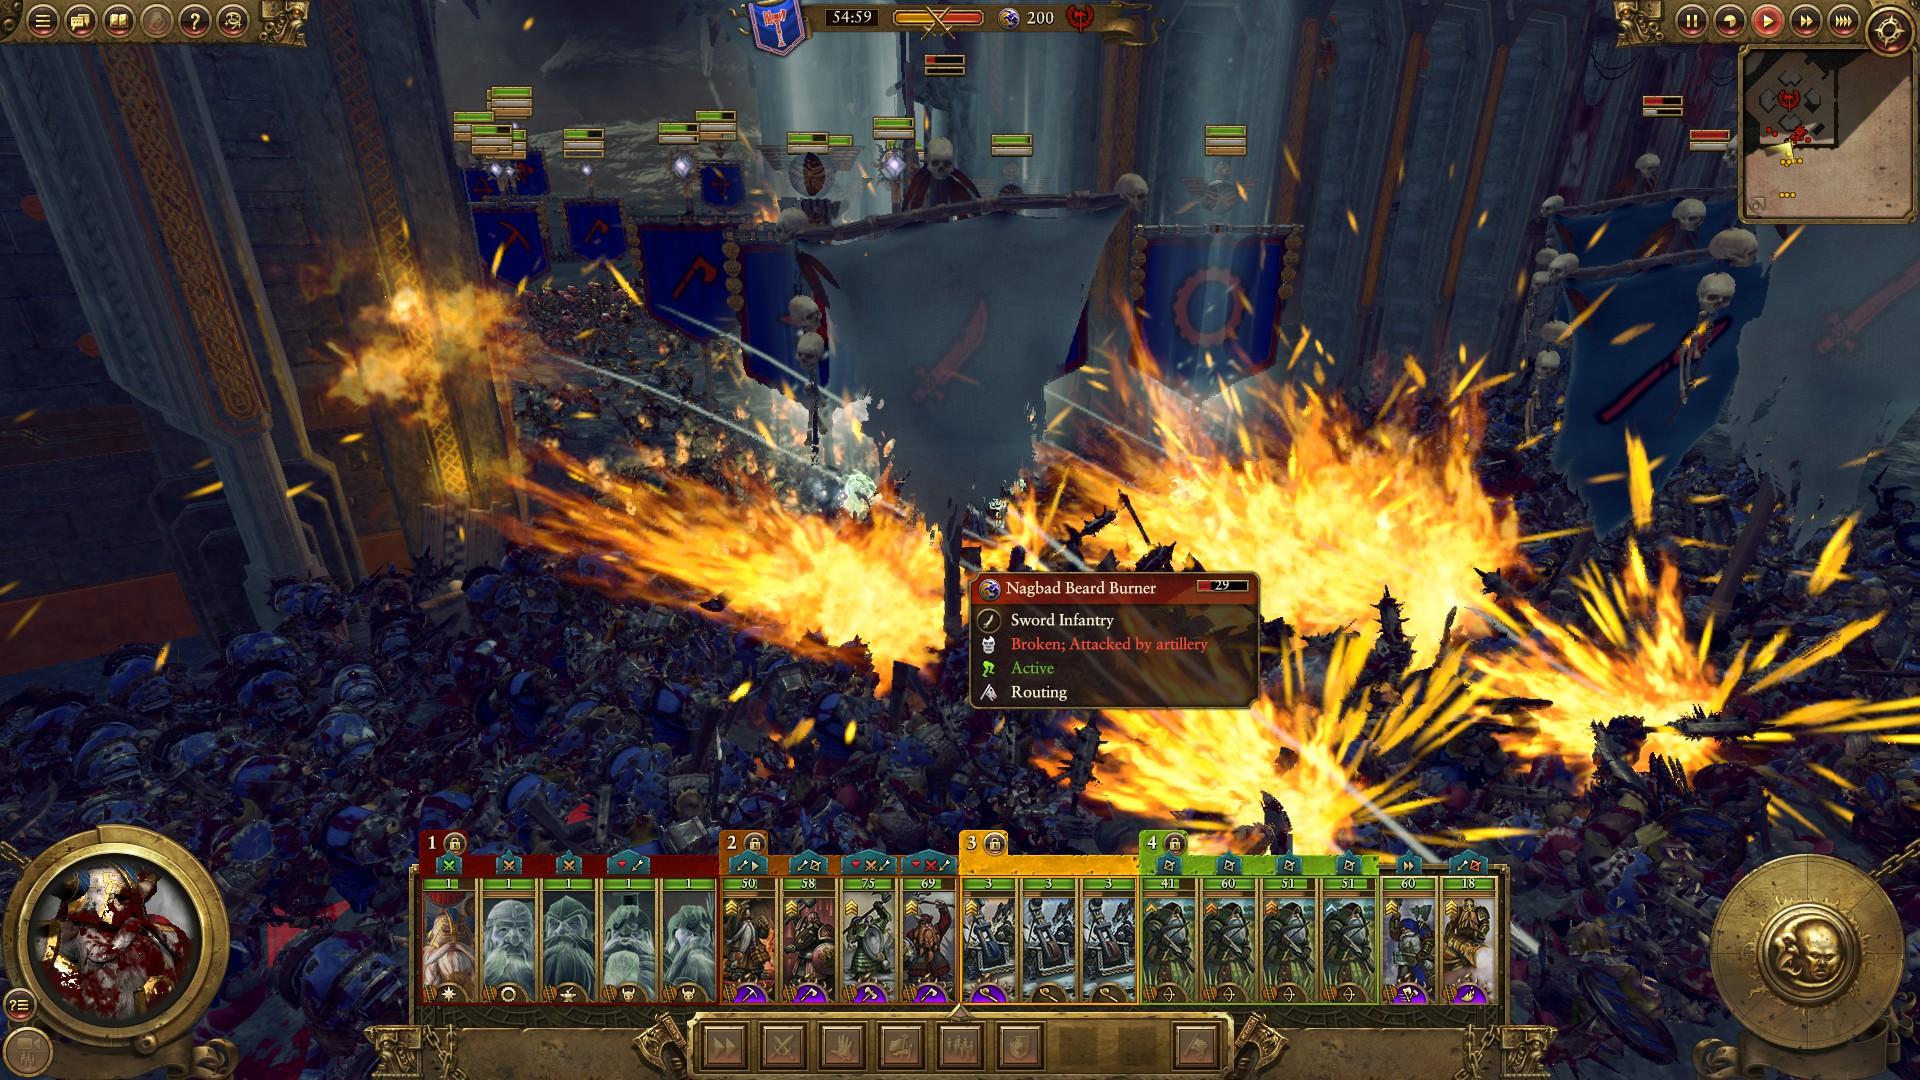 Steam Community Guide Clan Angrund Guide The Fewer Dwarfs